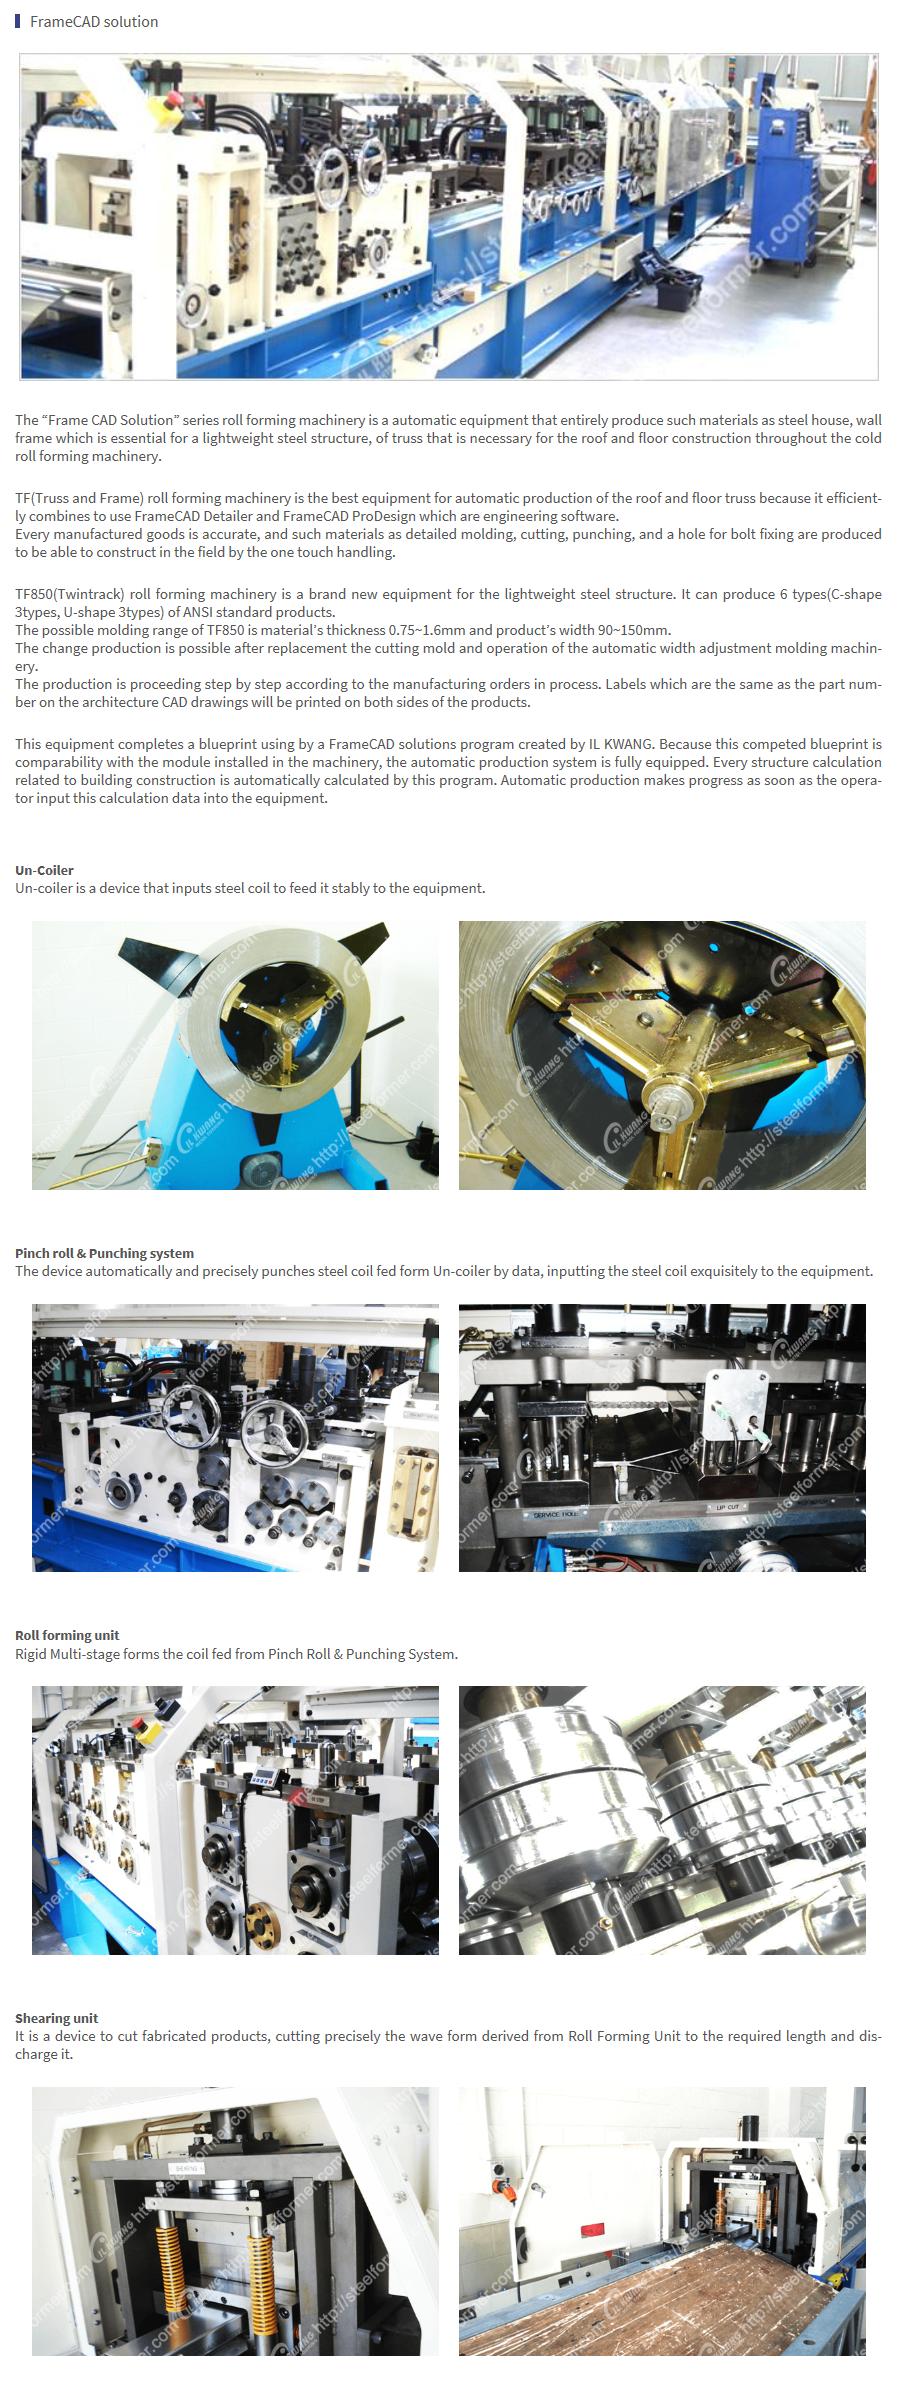 ILKWANG Metal Forming FrameCAD Solution